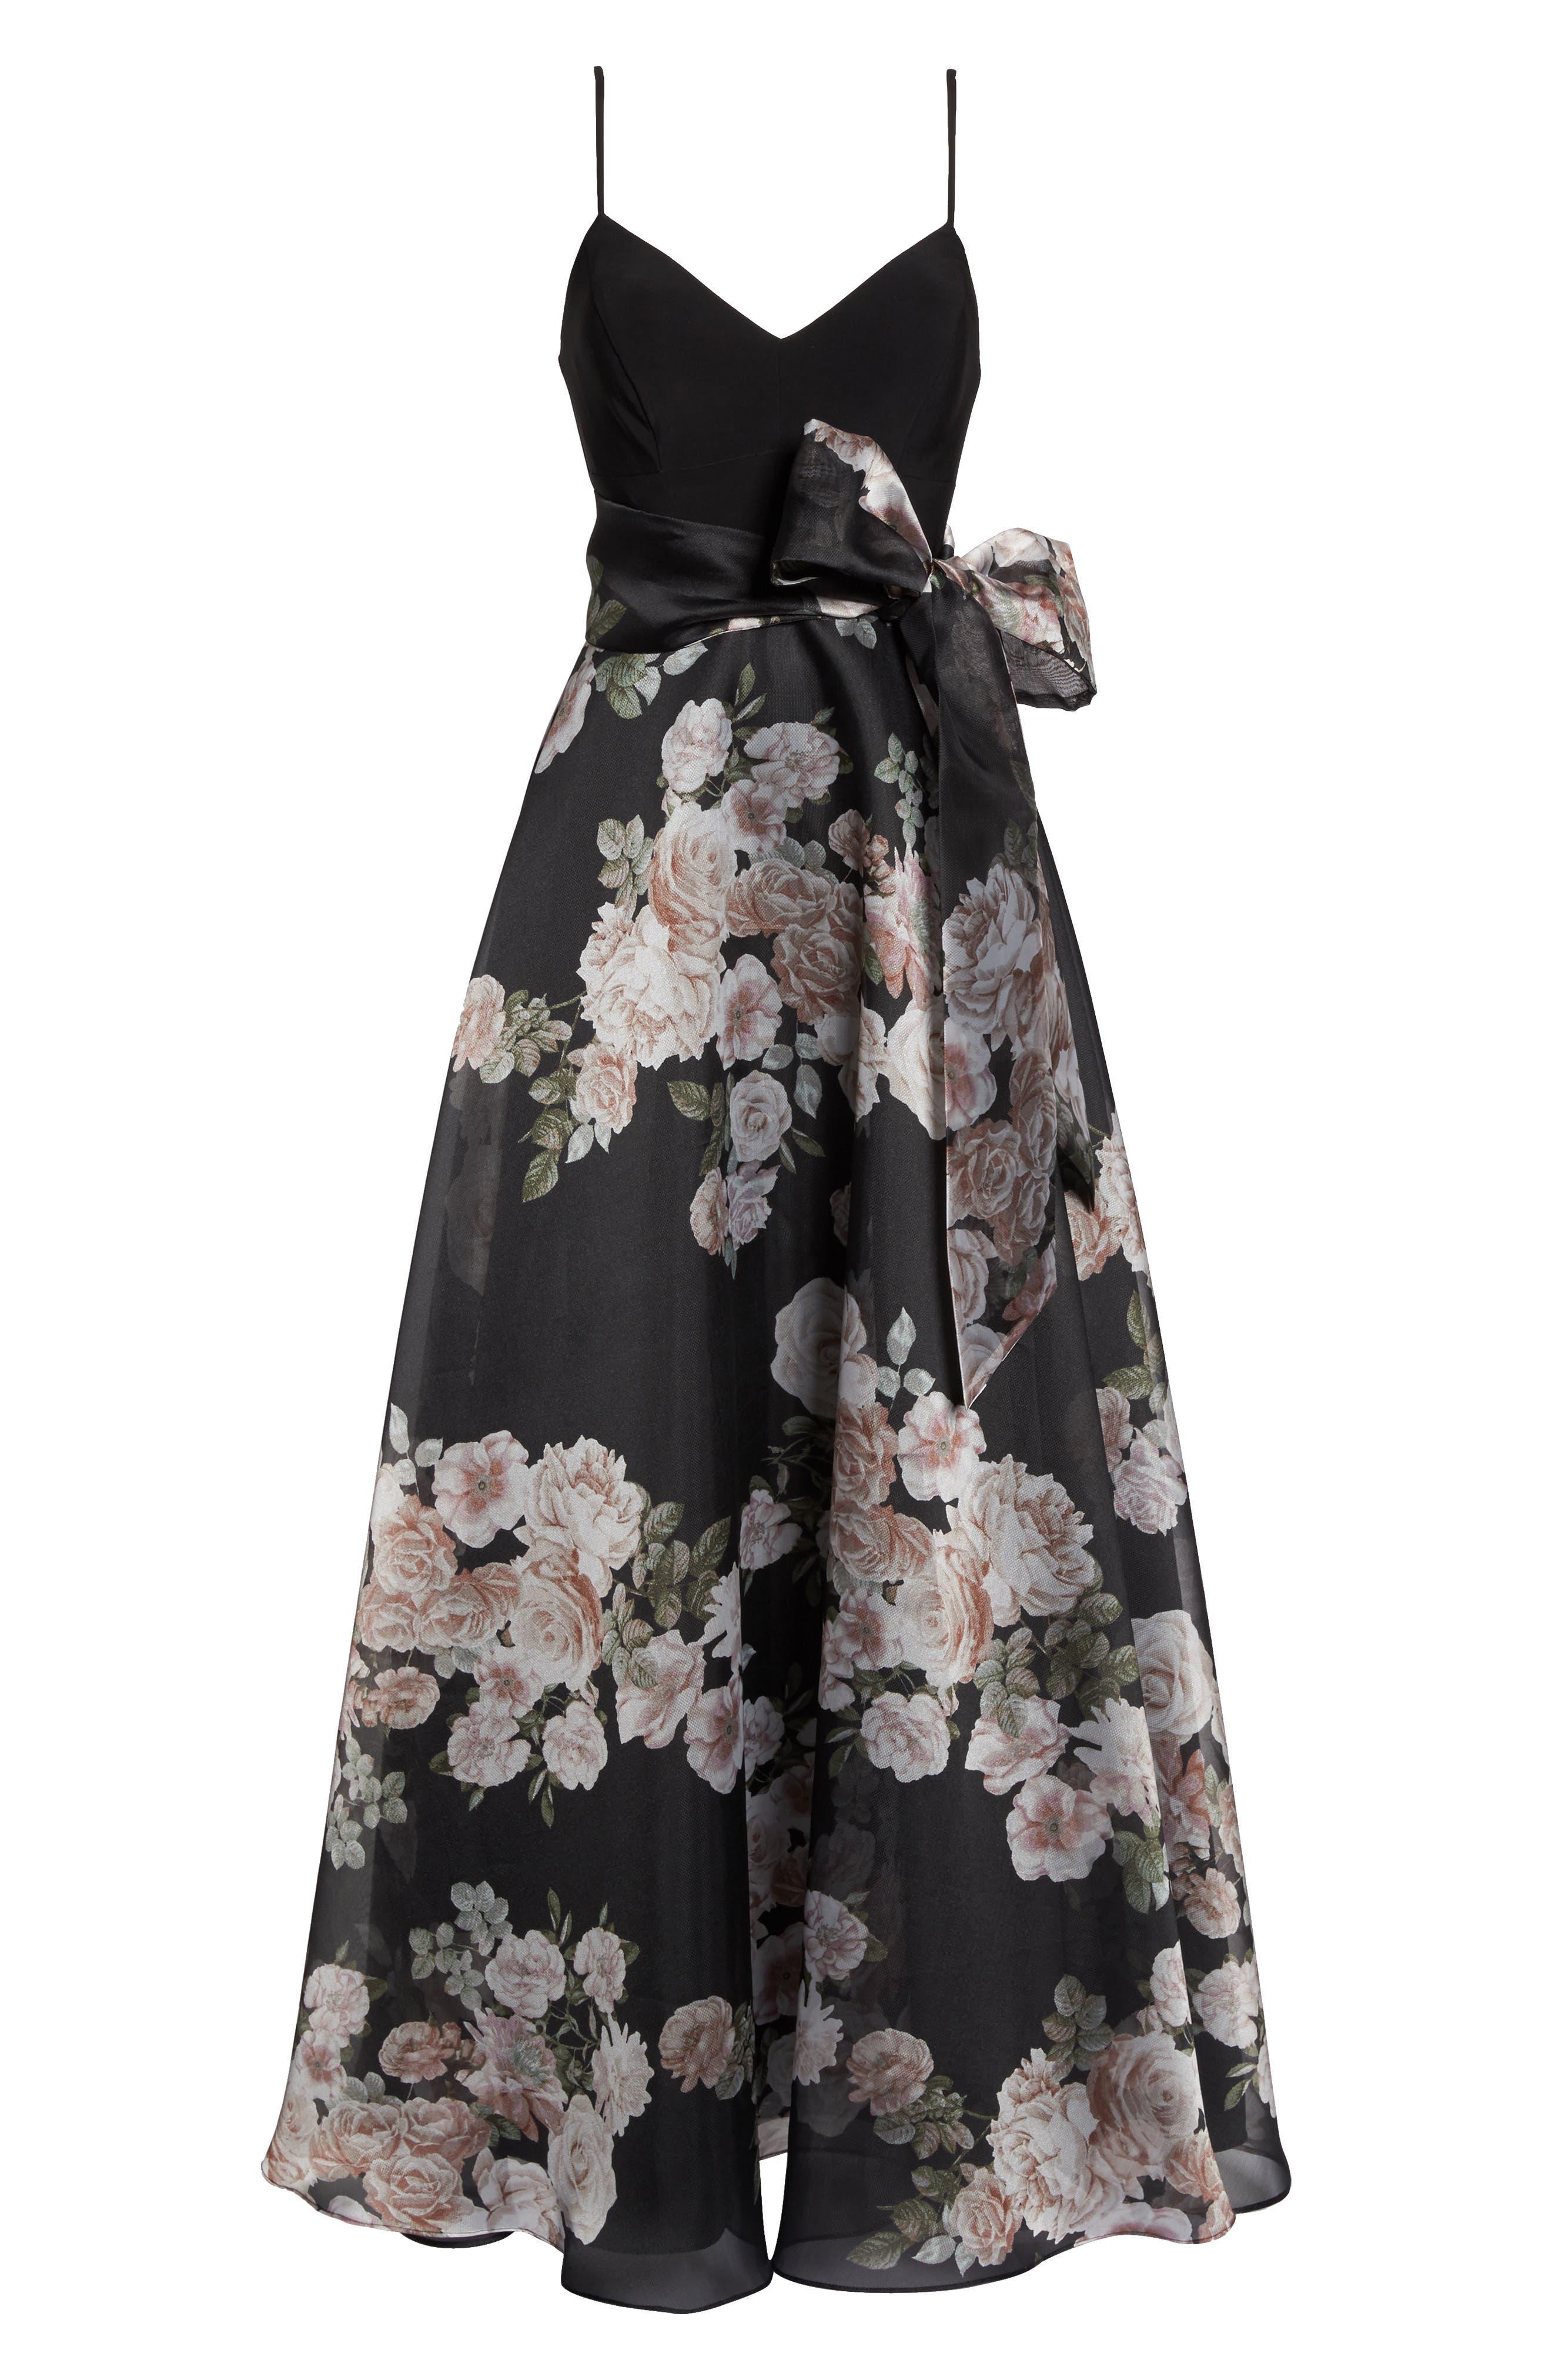 Knit & Print Organza Ballgown,                             Alternate thumbnail 7, color,                             Black/Blush